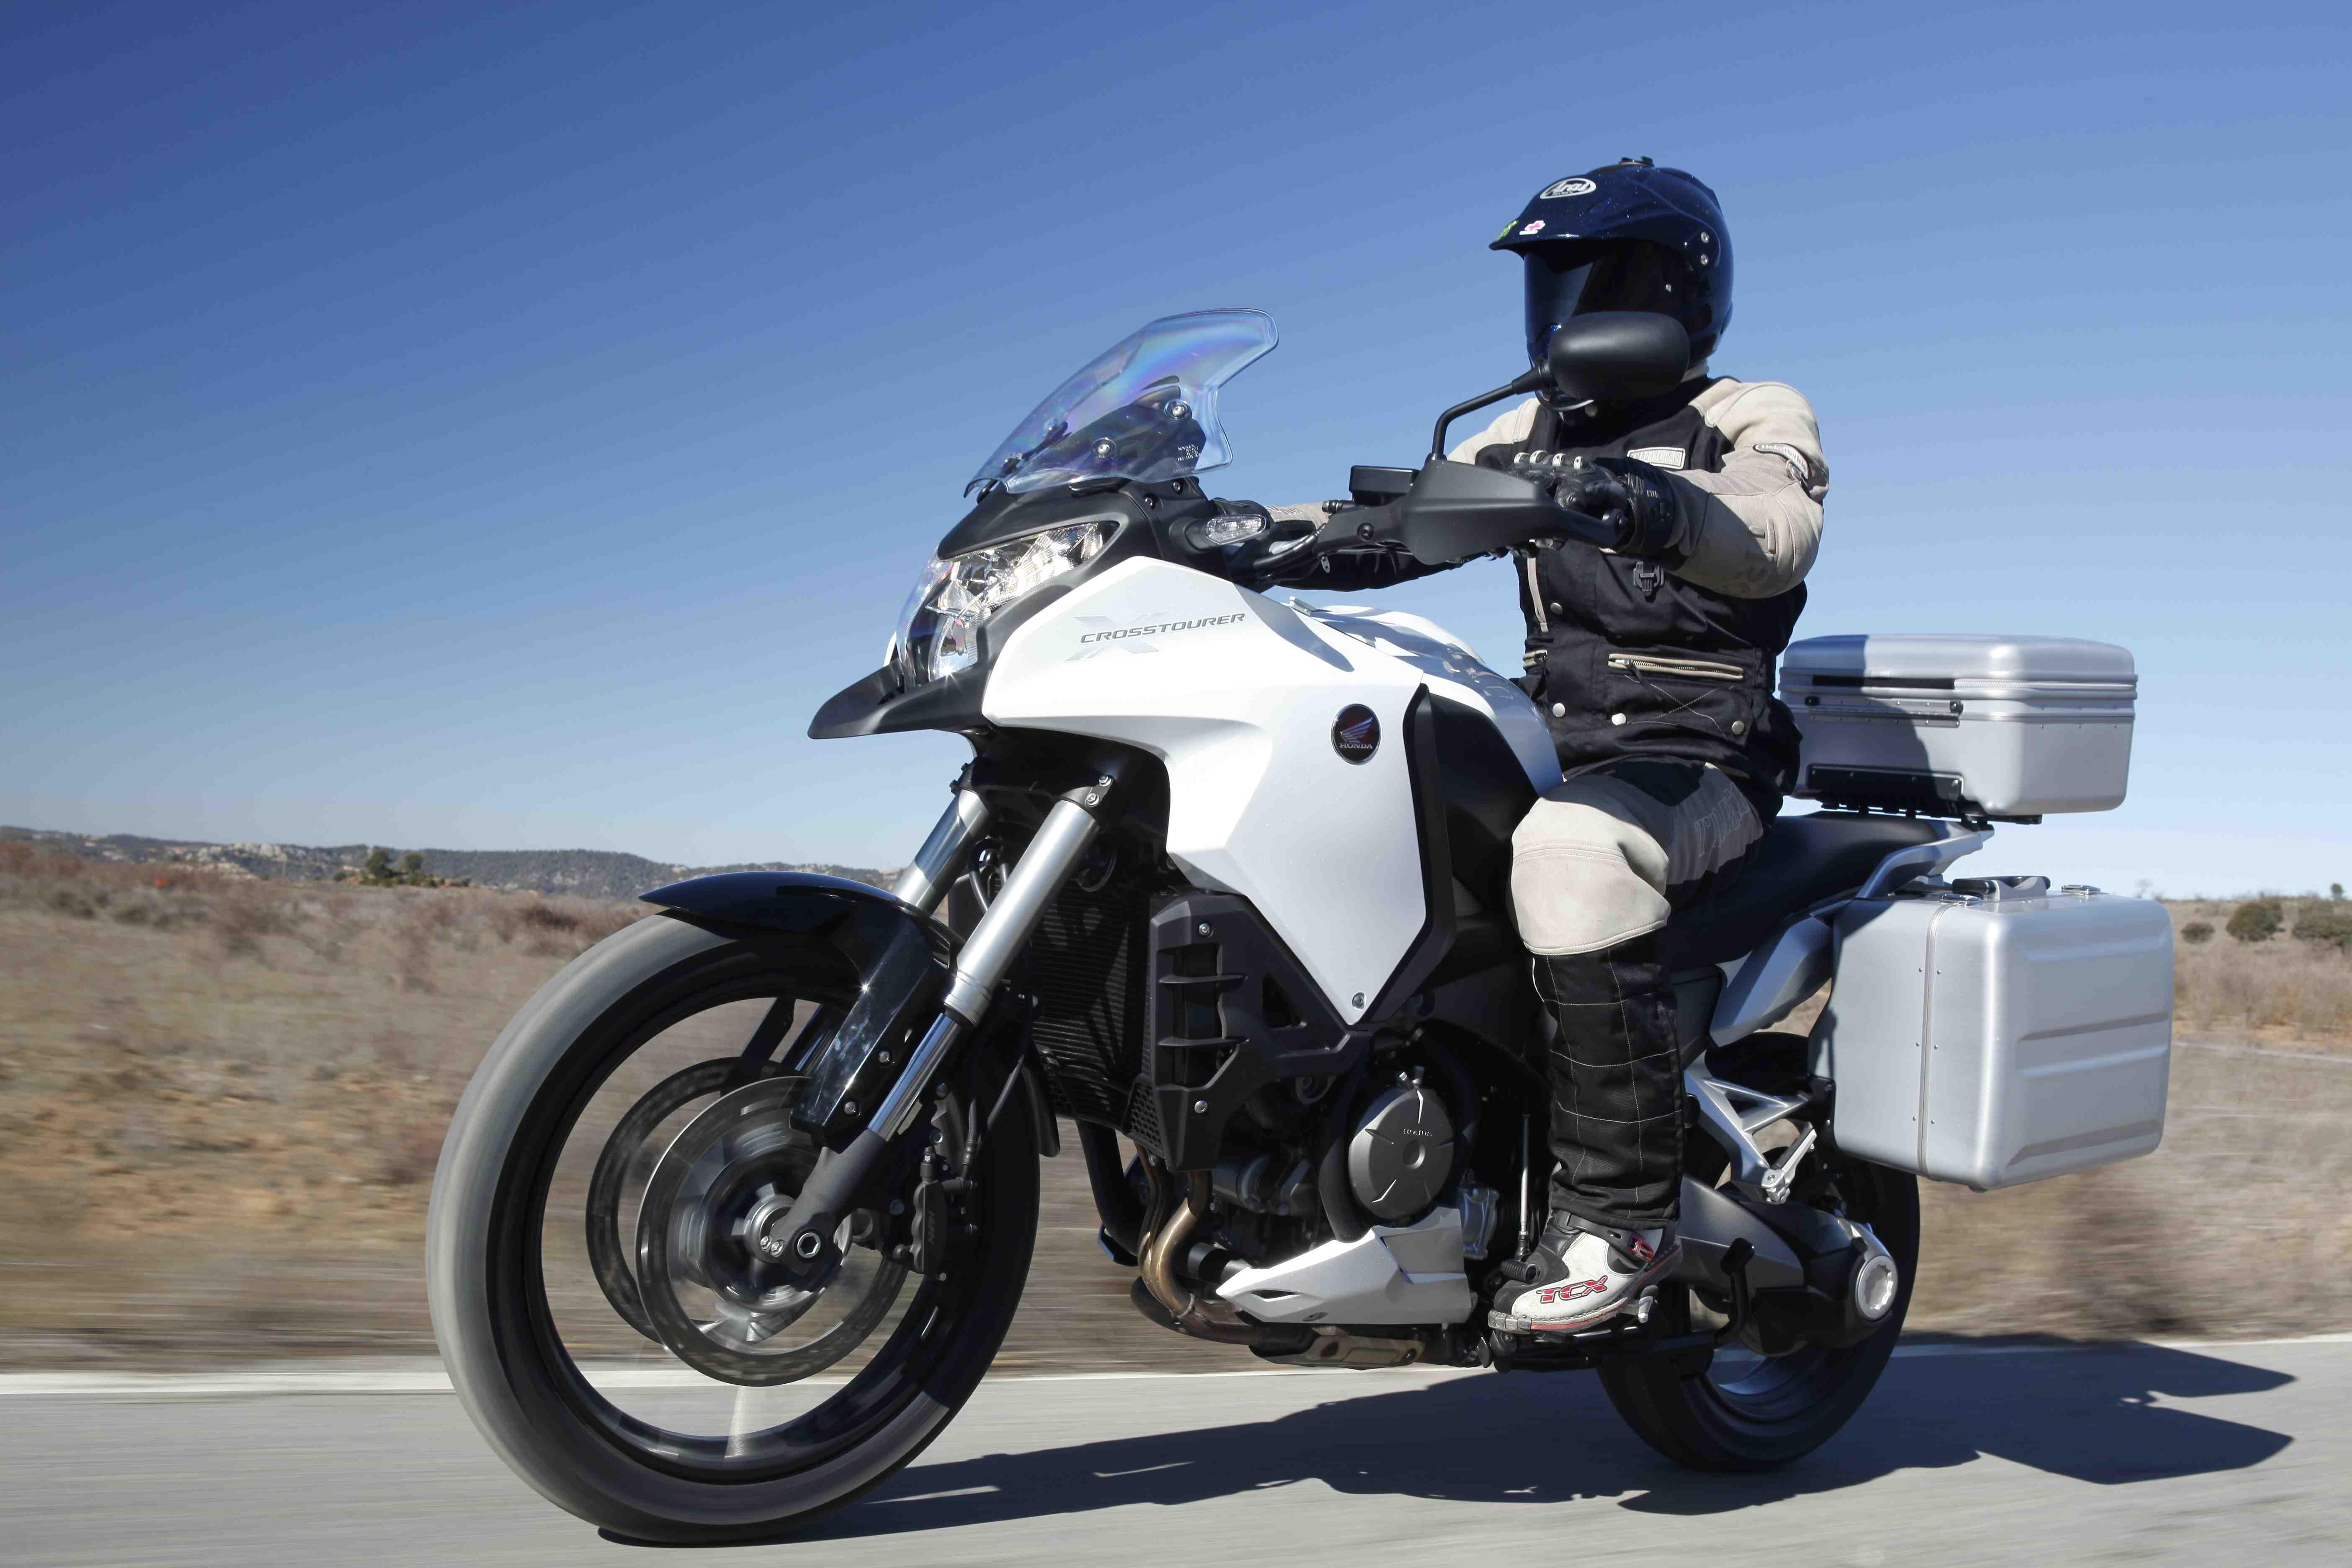 First Ride: Honda Crosstourer review | Visordown